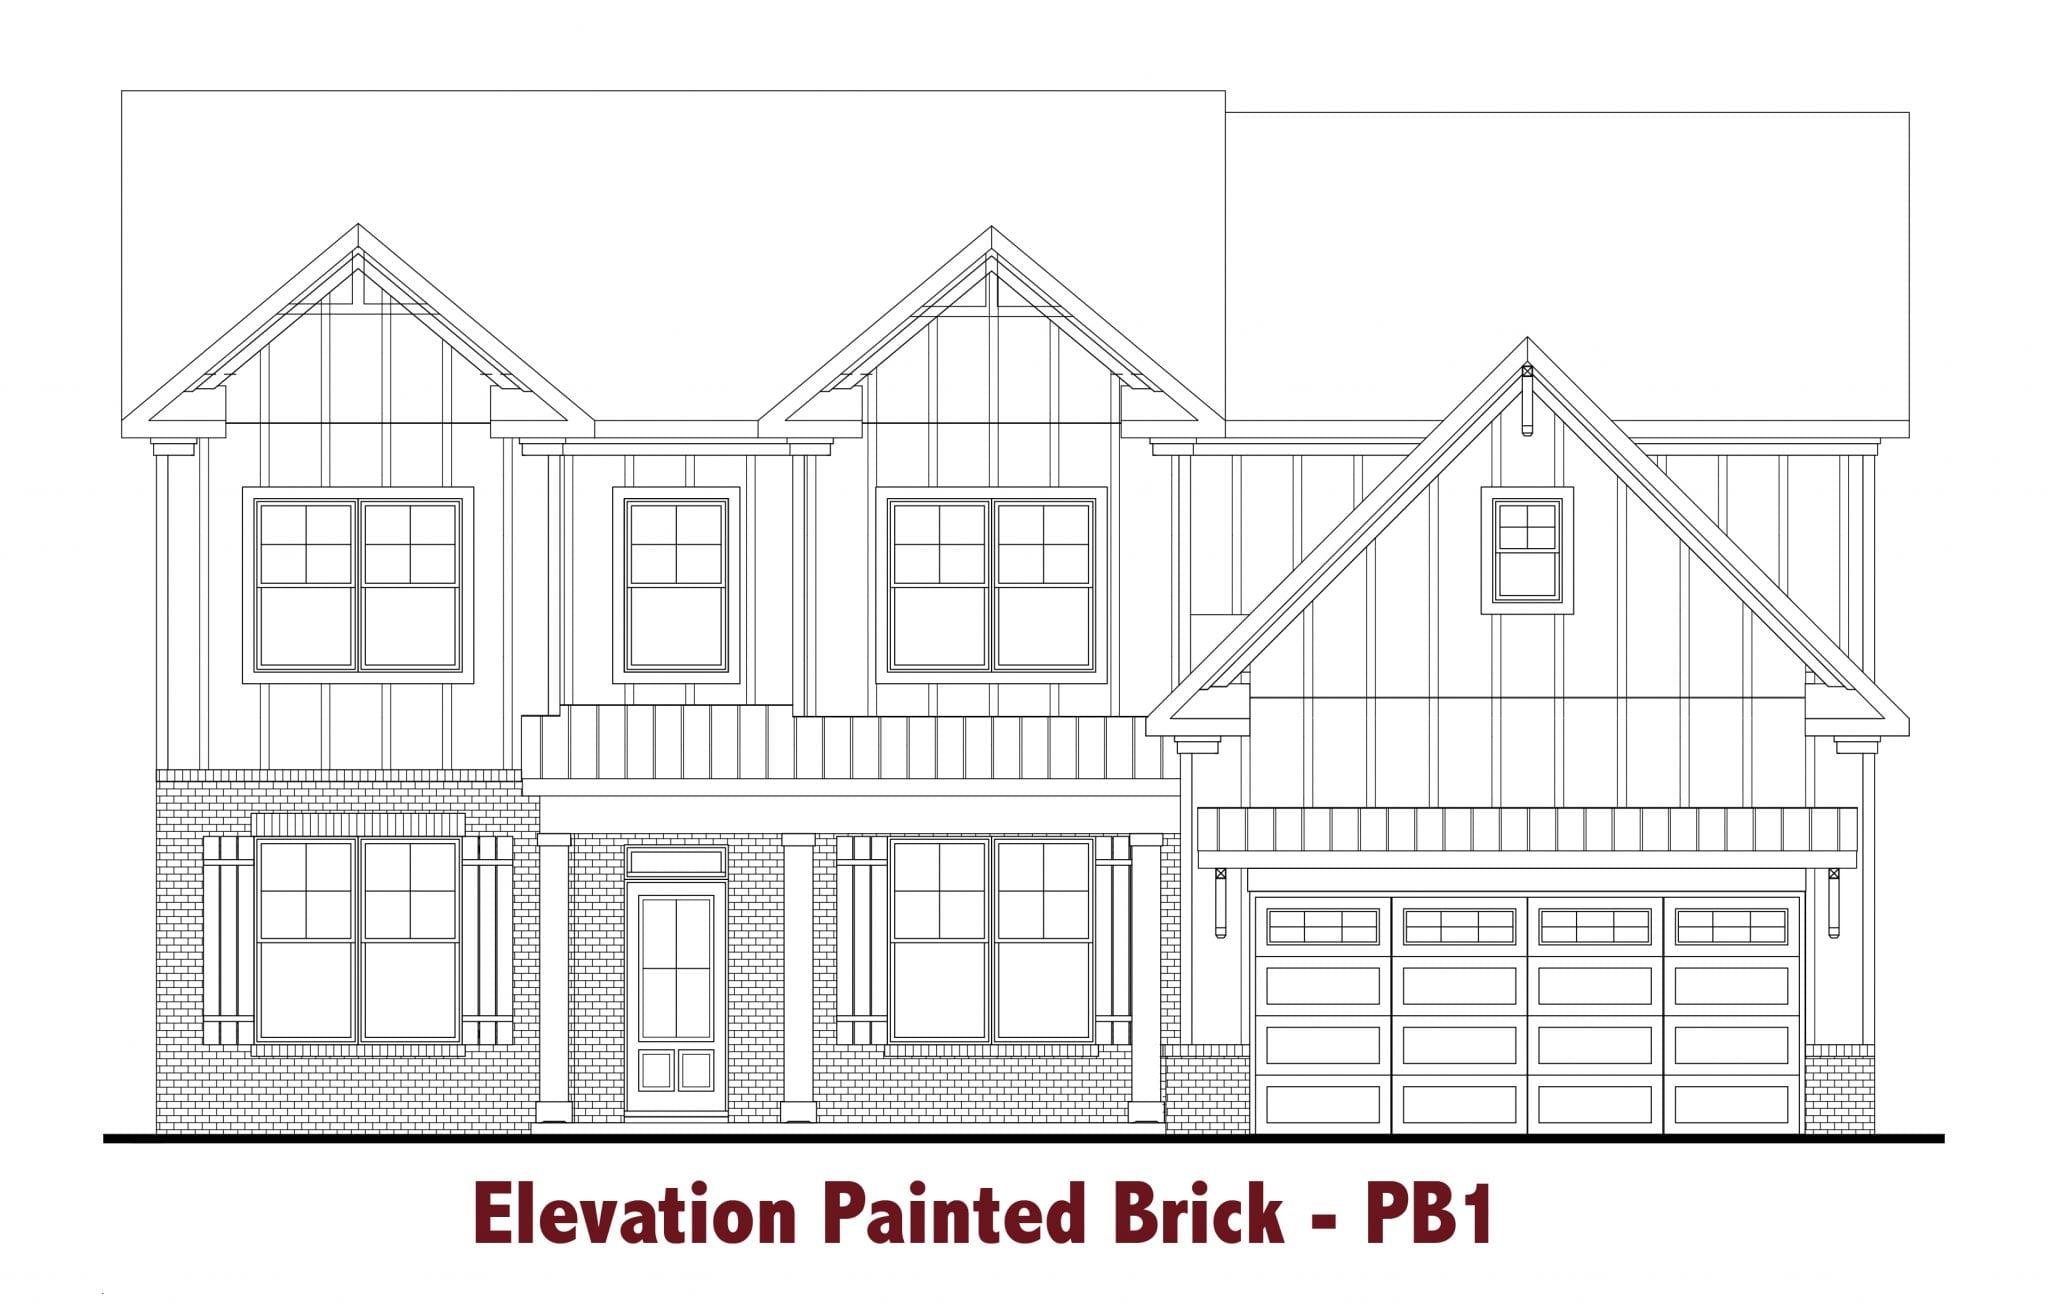 Brunswick-II elevations Image